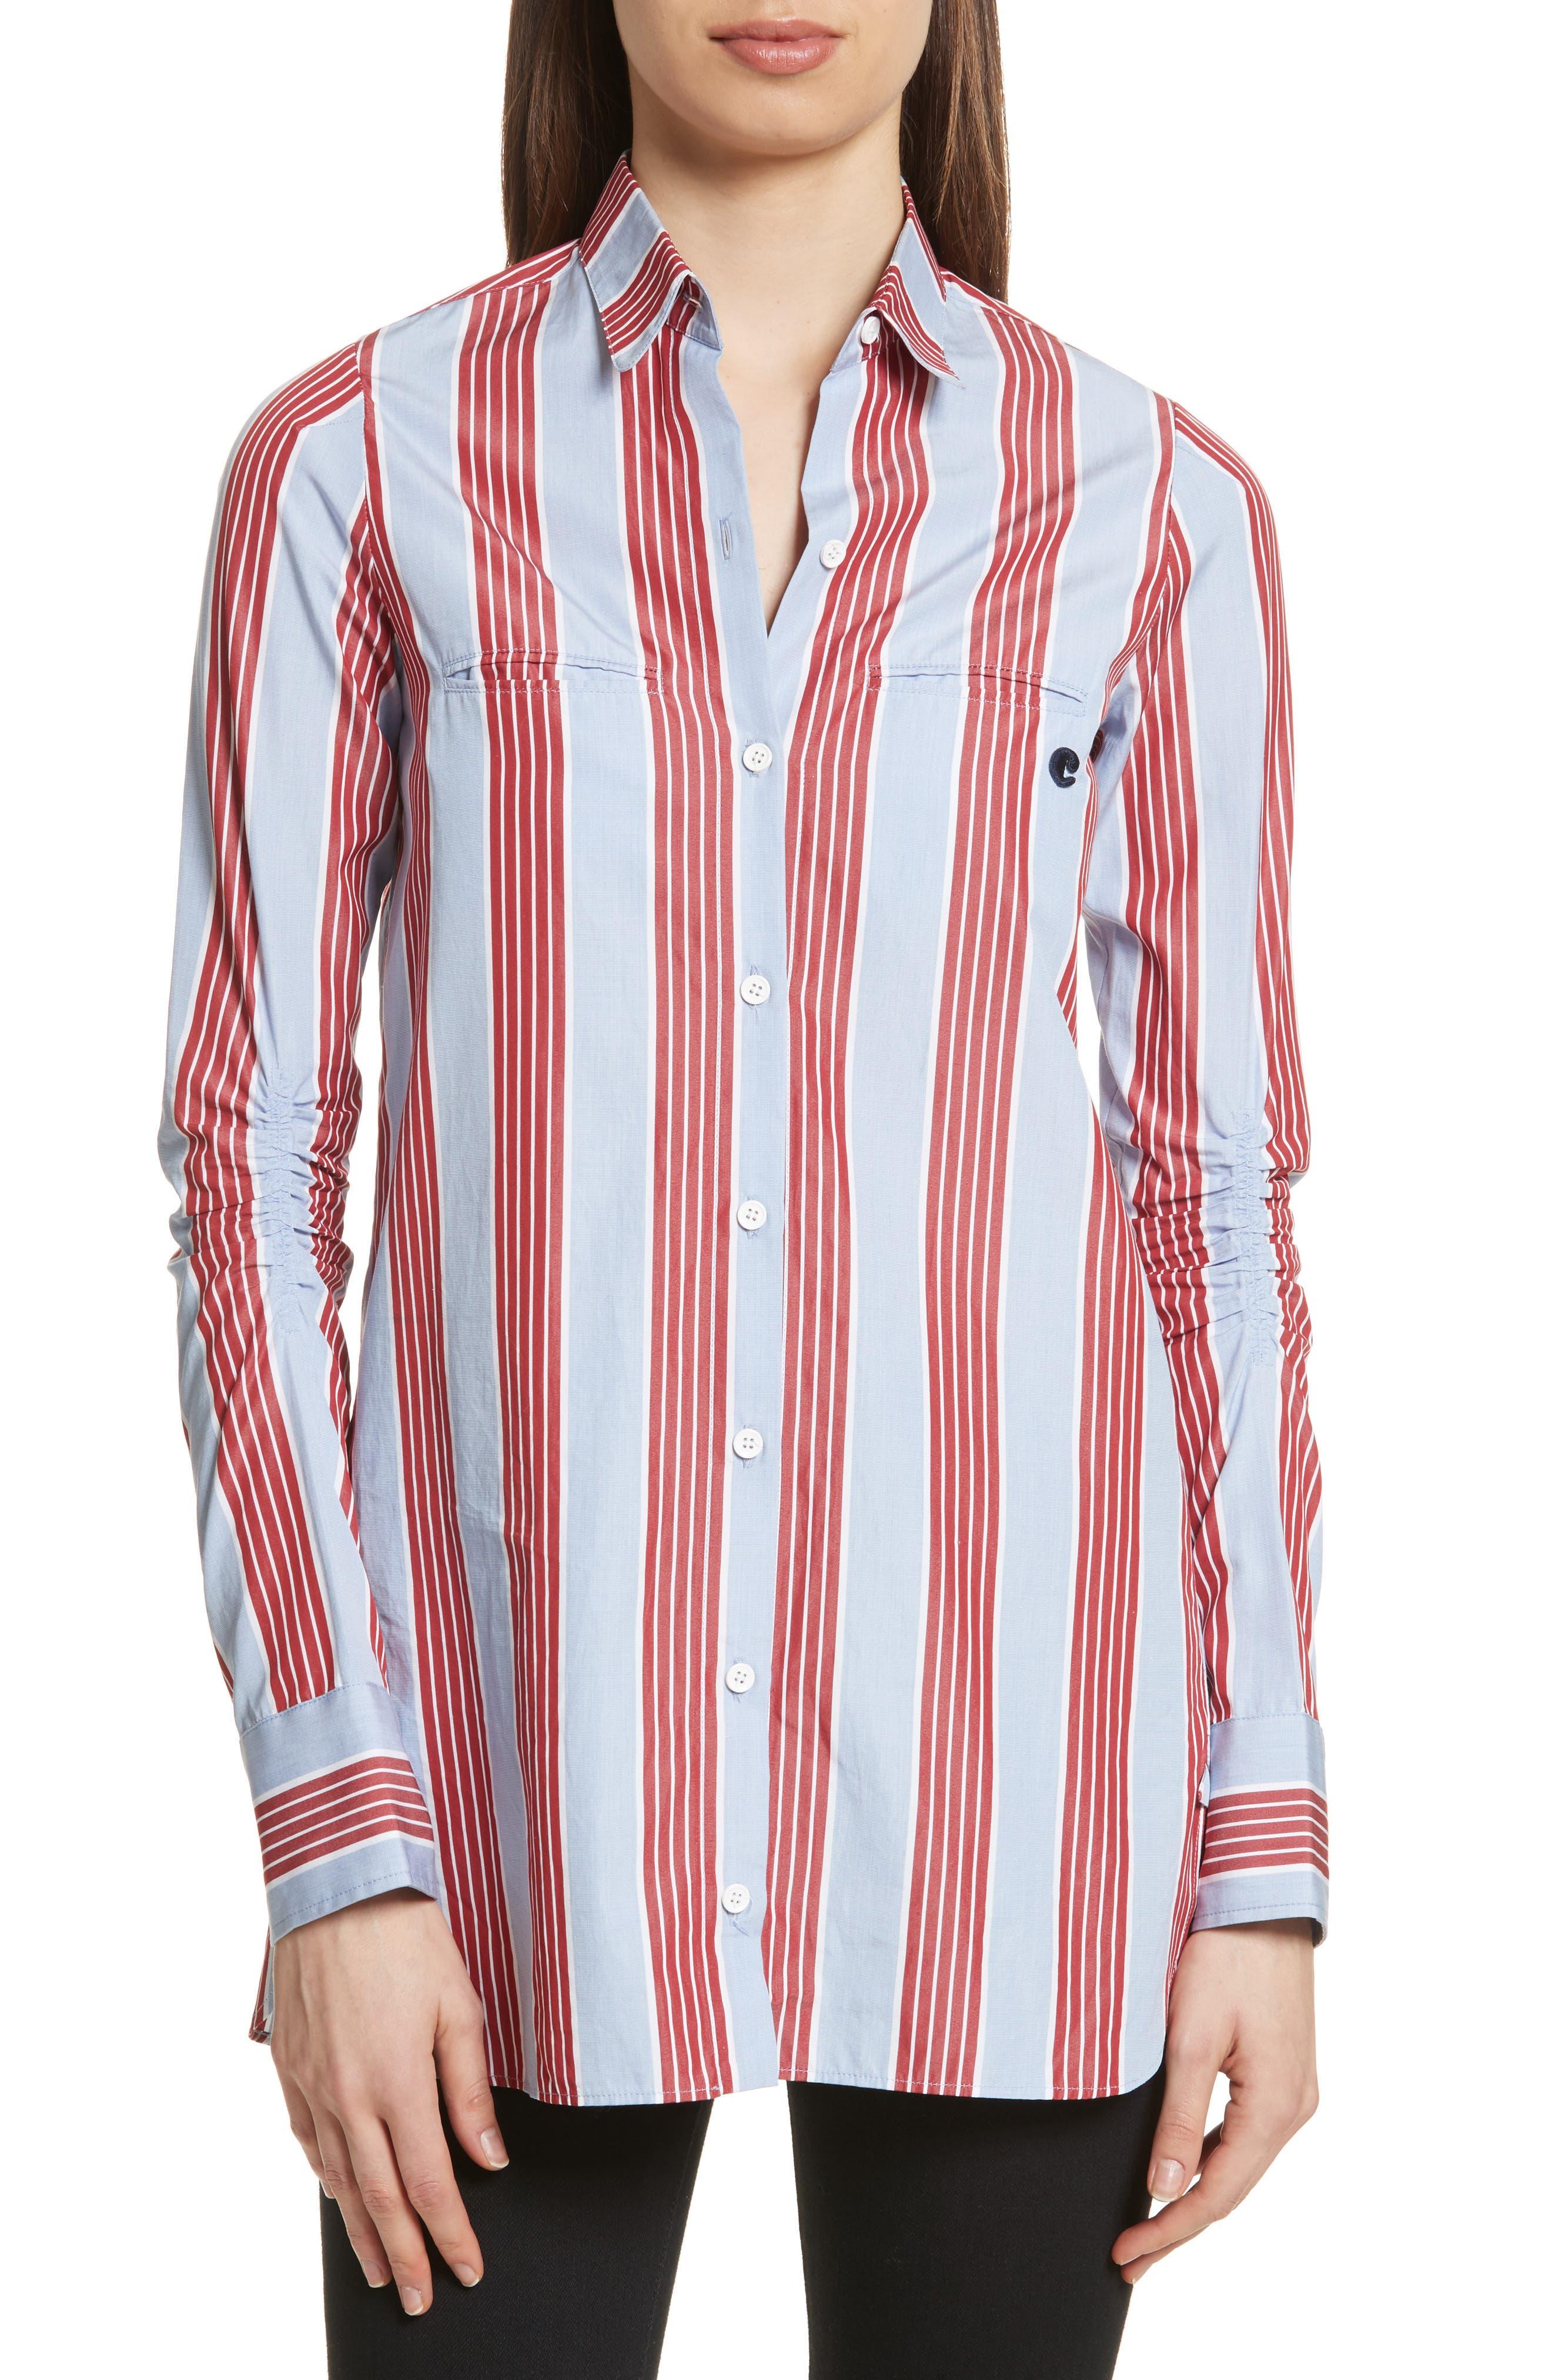 Main Image - Carven Chemise Manches Longues Stripe Shirt